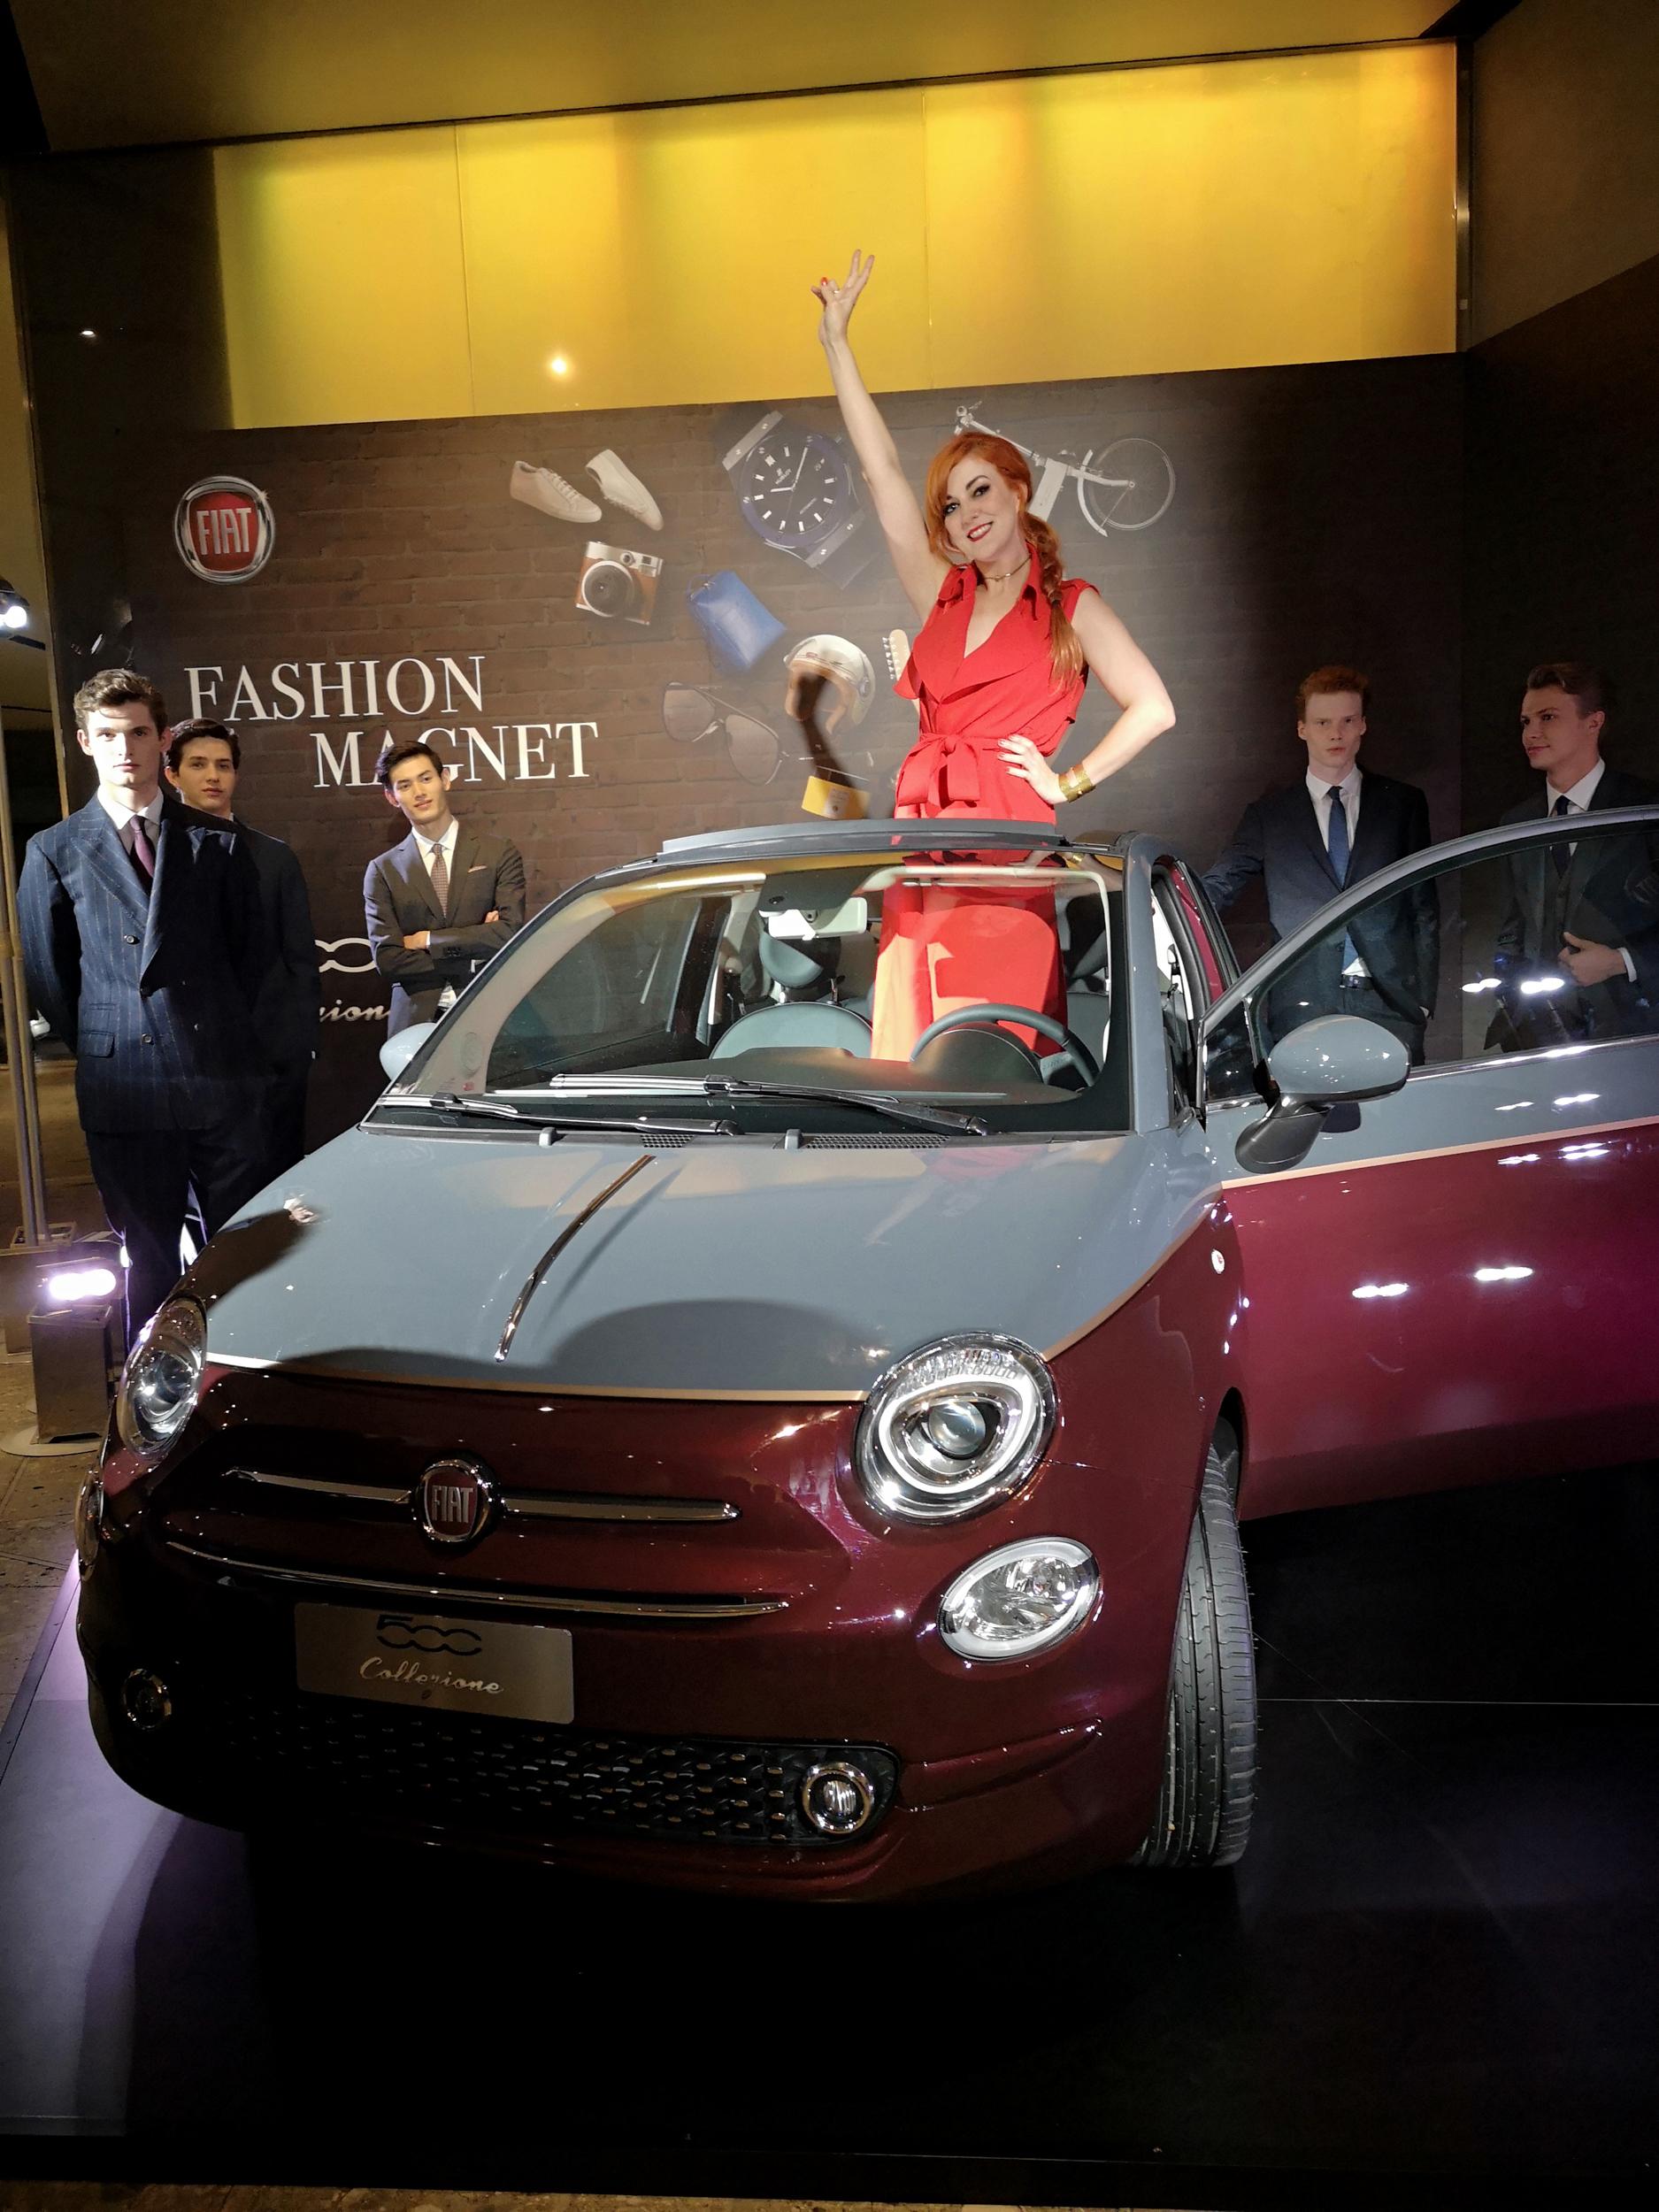 Fiat 500 Collezione – the new cinquecento in it's L'Uomo Vogue fall fashion colours of deep Bordeaux burgundy and grey.